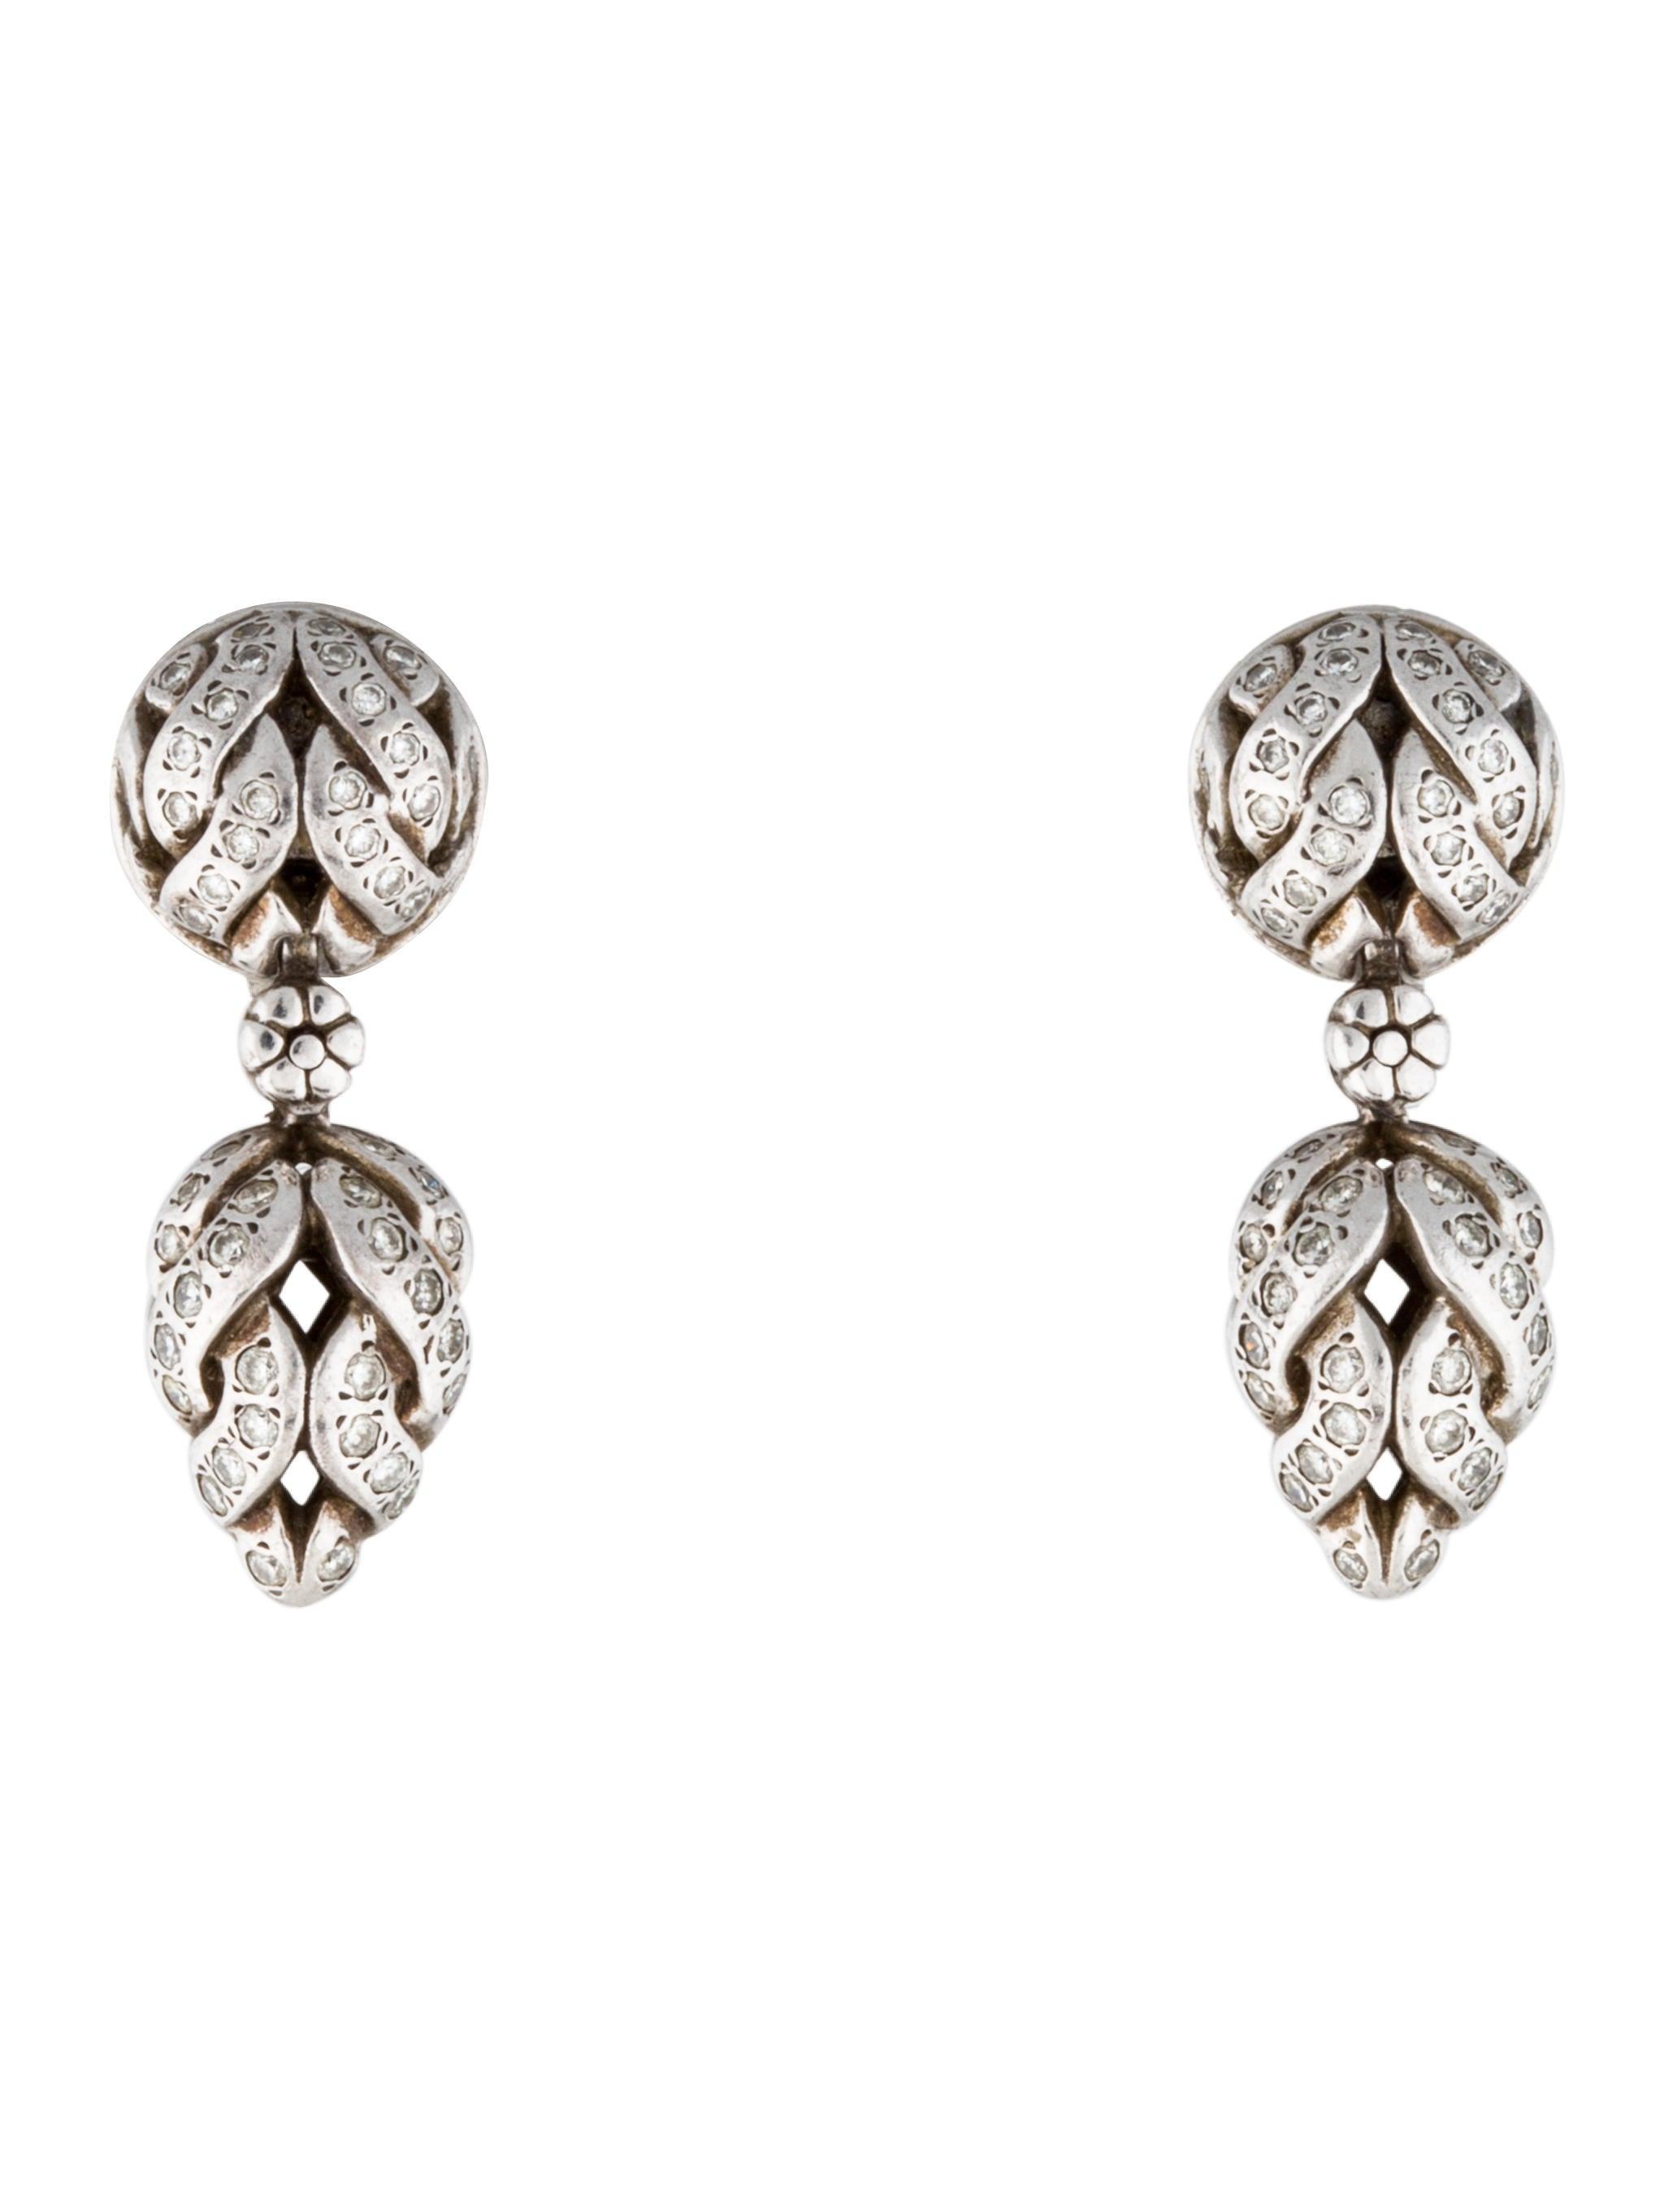 John hardy diamond drop earrings jewelry jha23117 for John hardy jewelry earrings